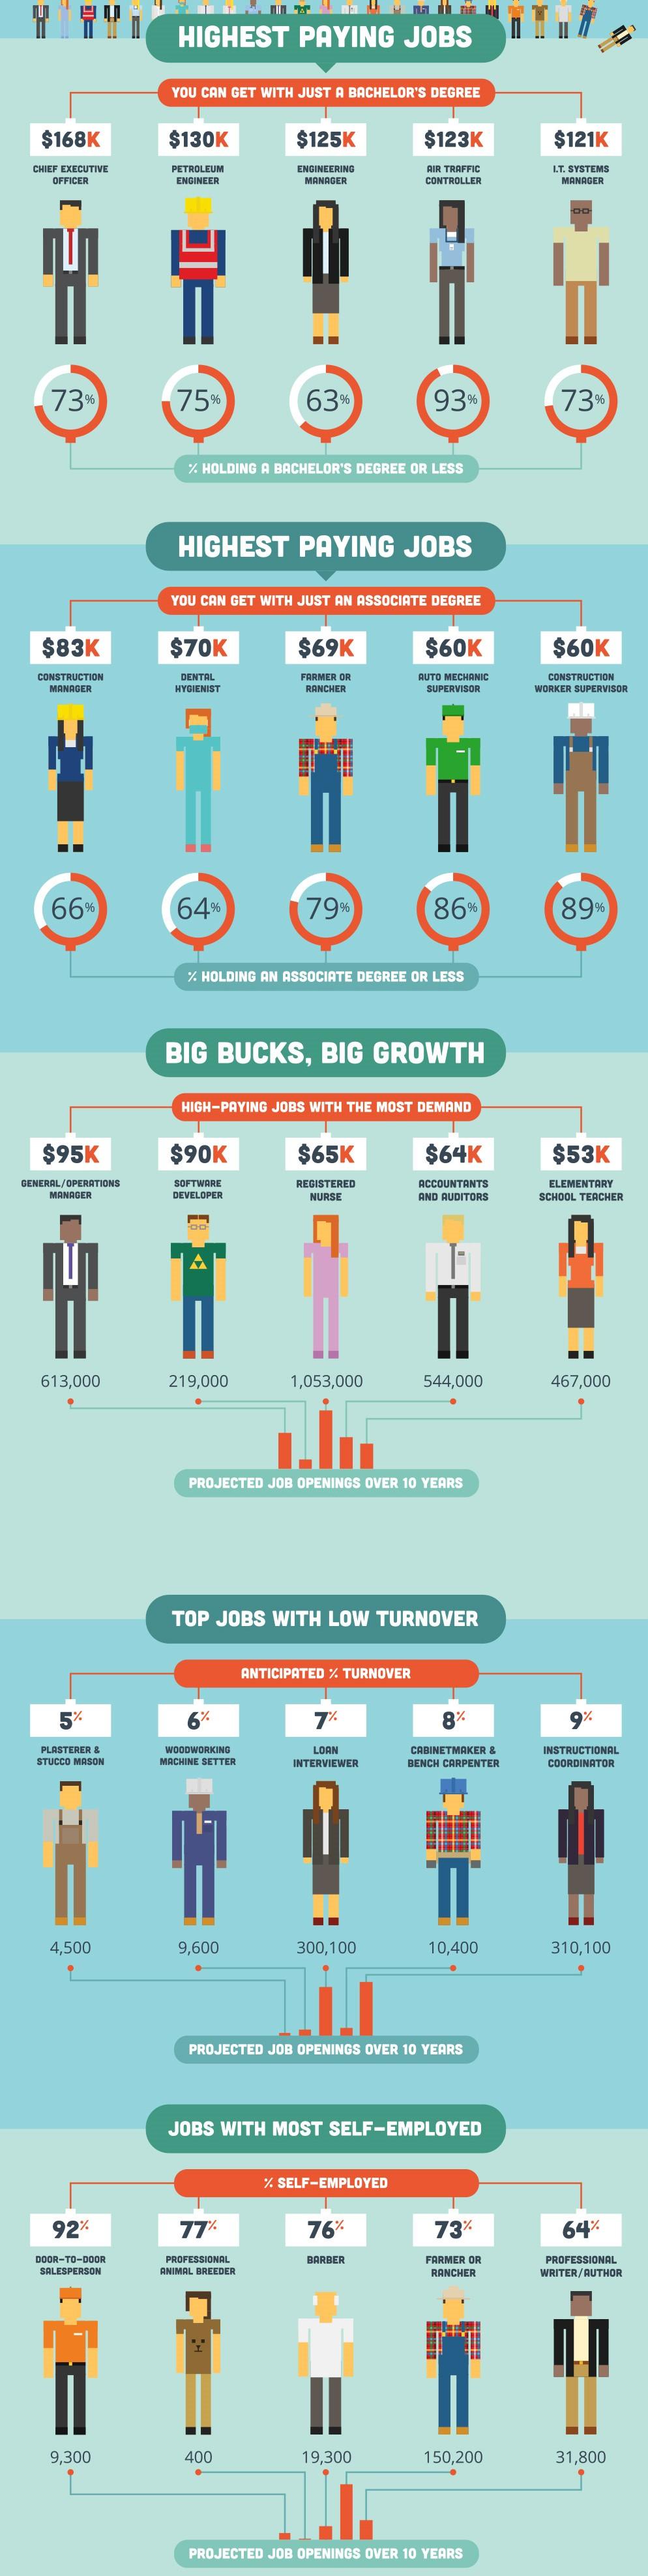 careers-infographic.jpg